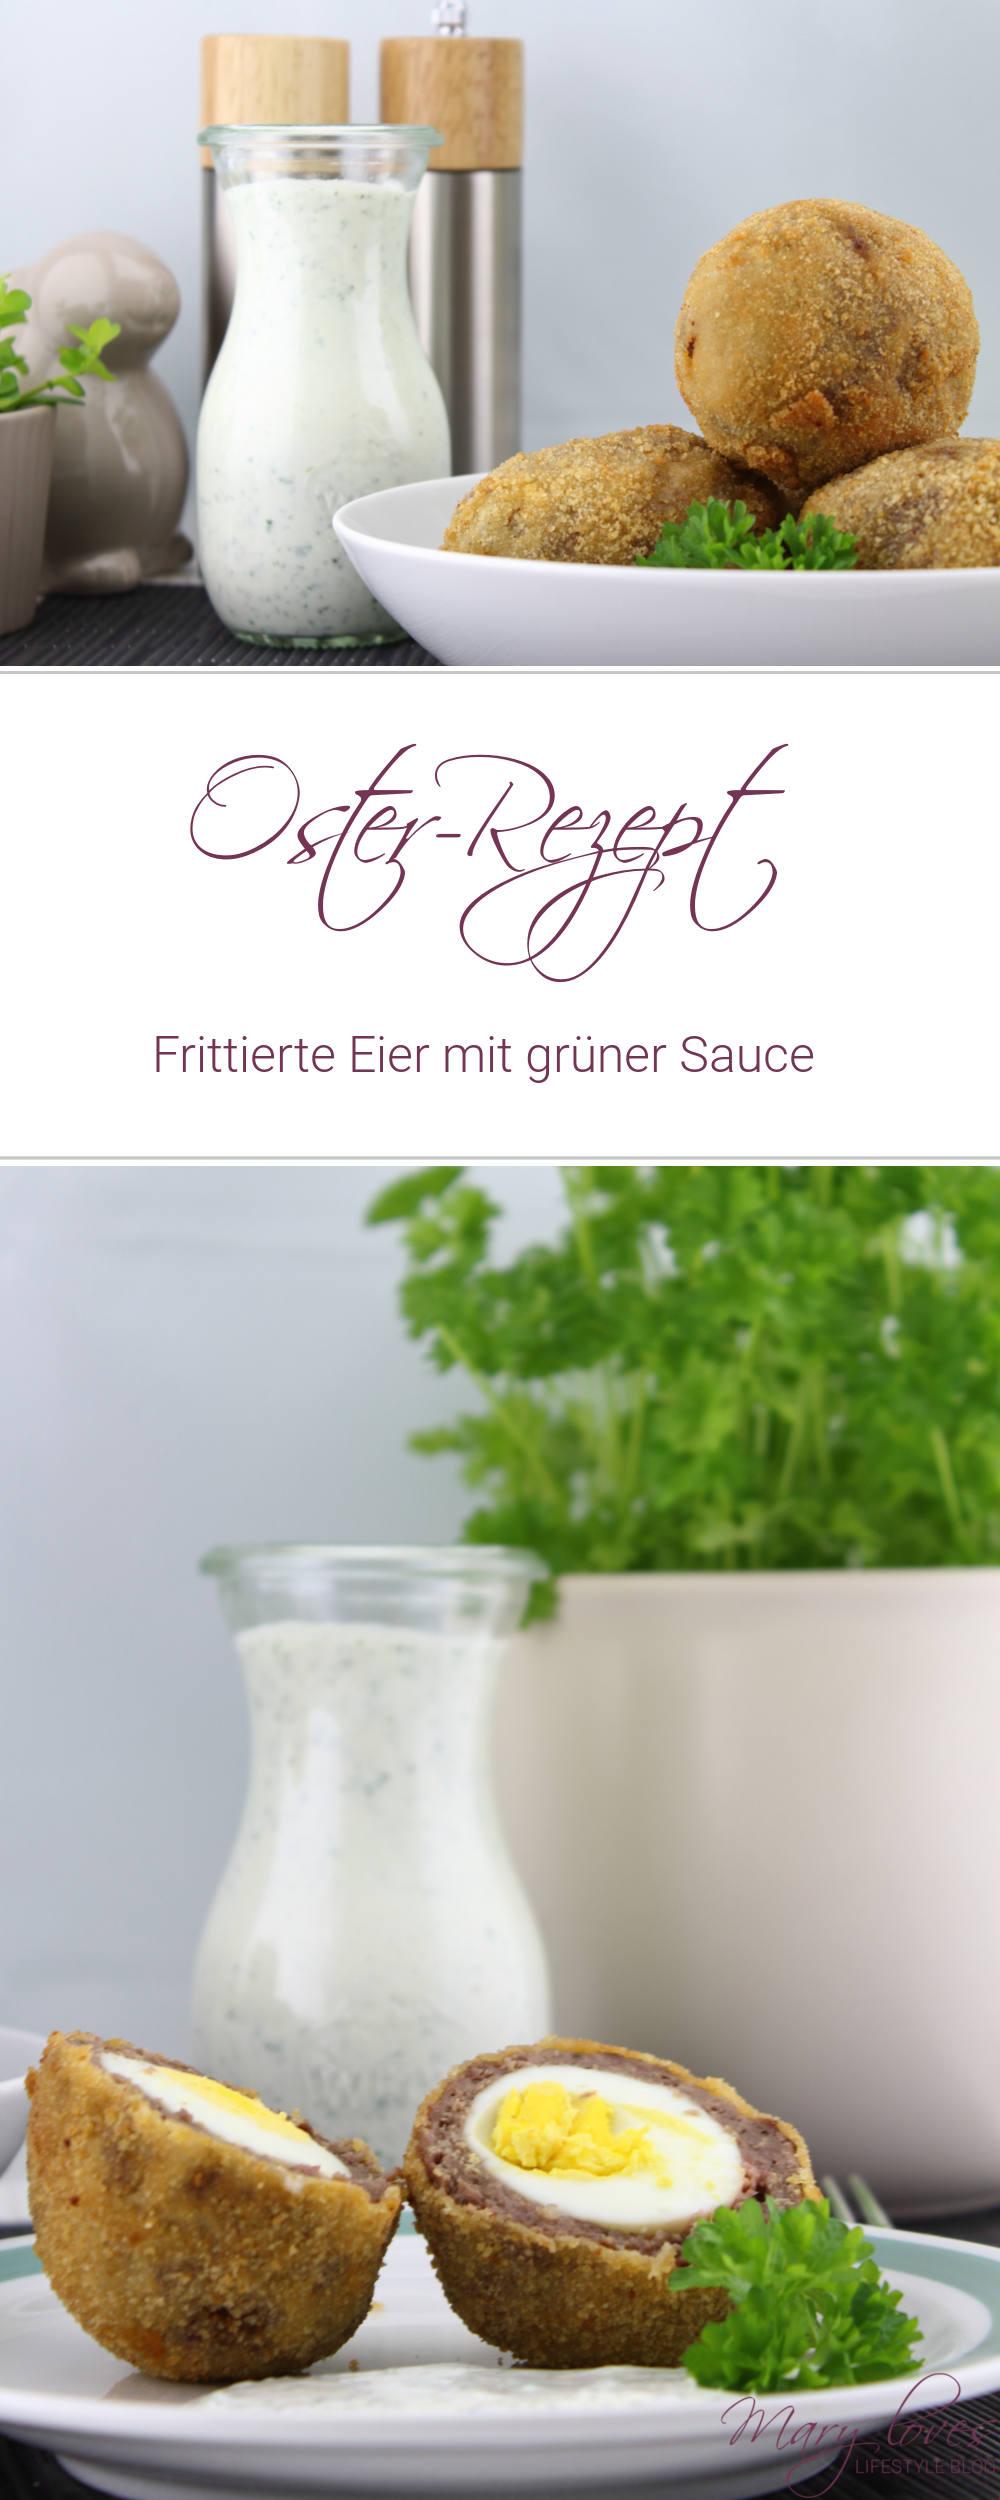 [Oster-Rezept] Frittierte Eier mit grüner Sauce - Rezept fürs Osteressen - die Frikadellen-Eier schmecken warm oder kalt - ostern, rezept, osterrezept, gekochte Eier, hessische grüne sauce